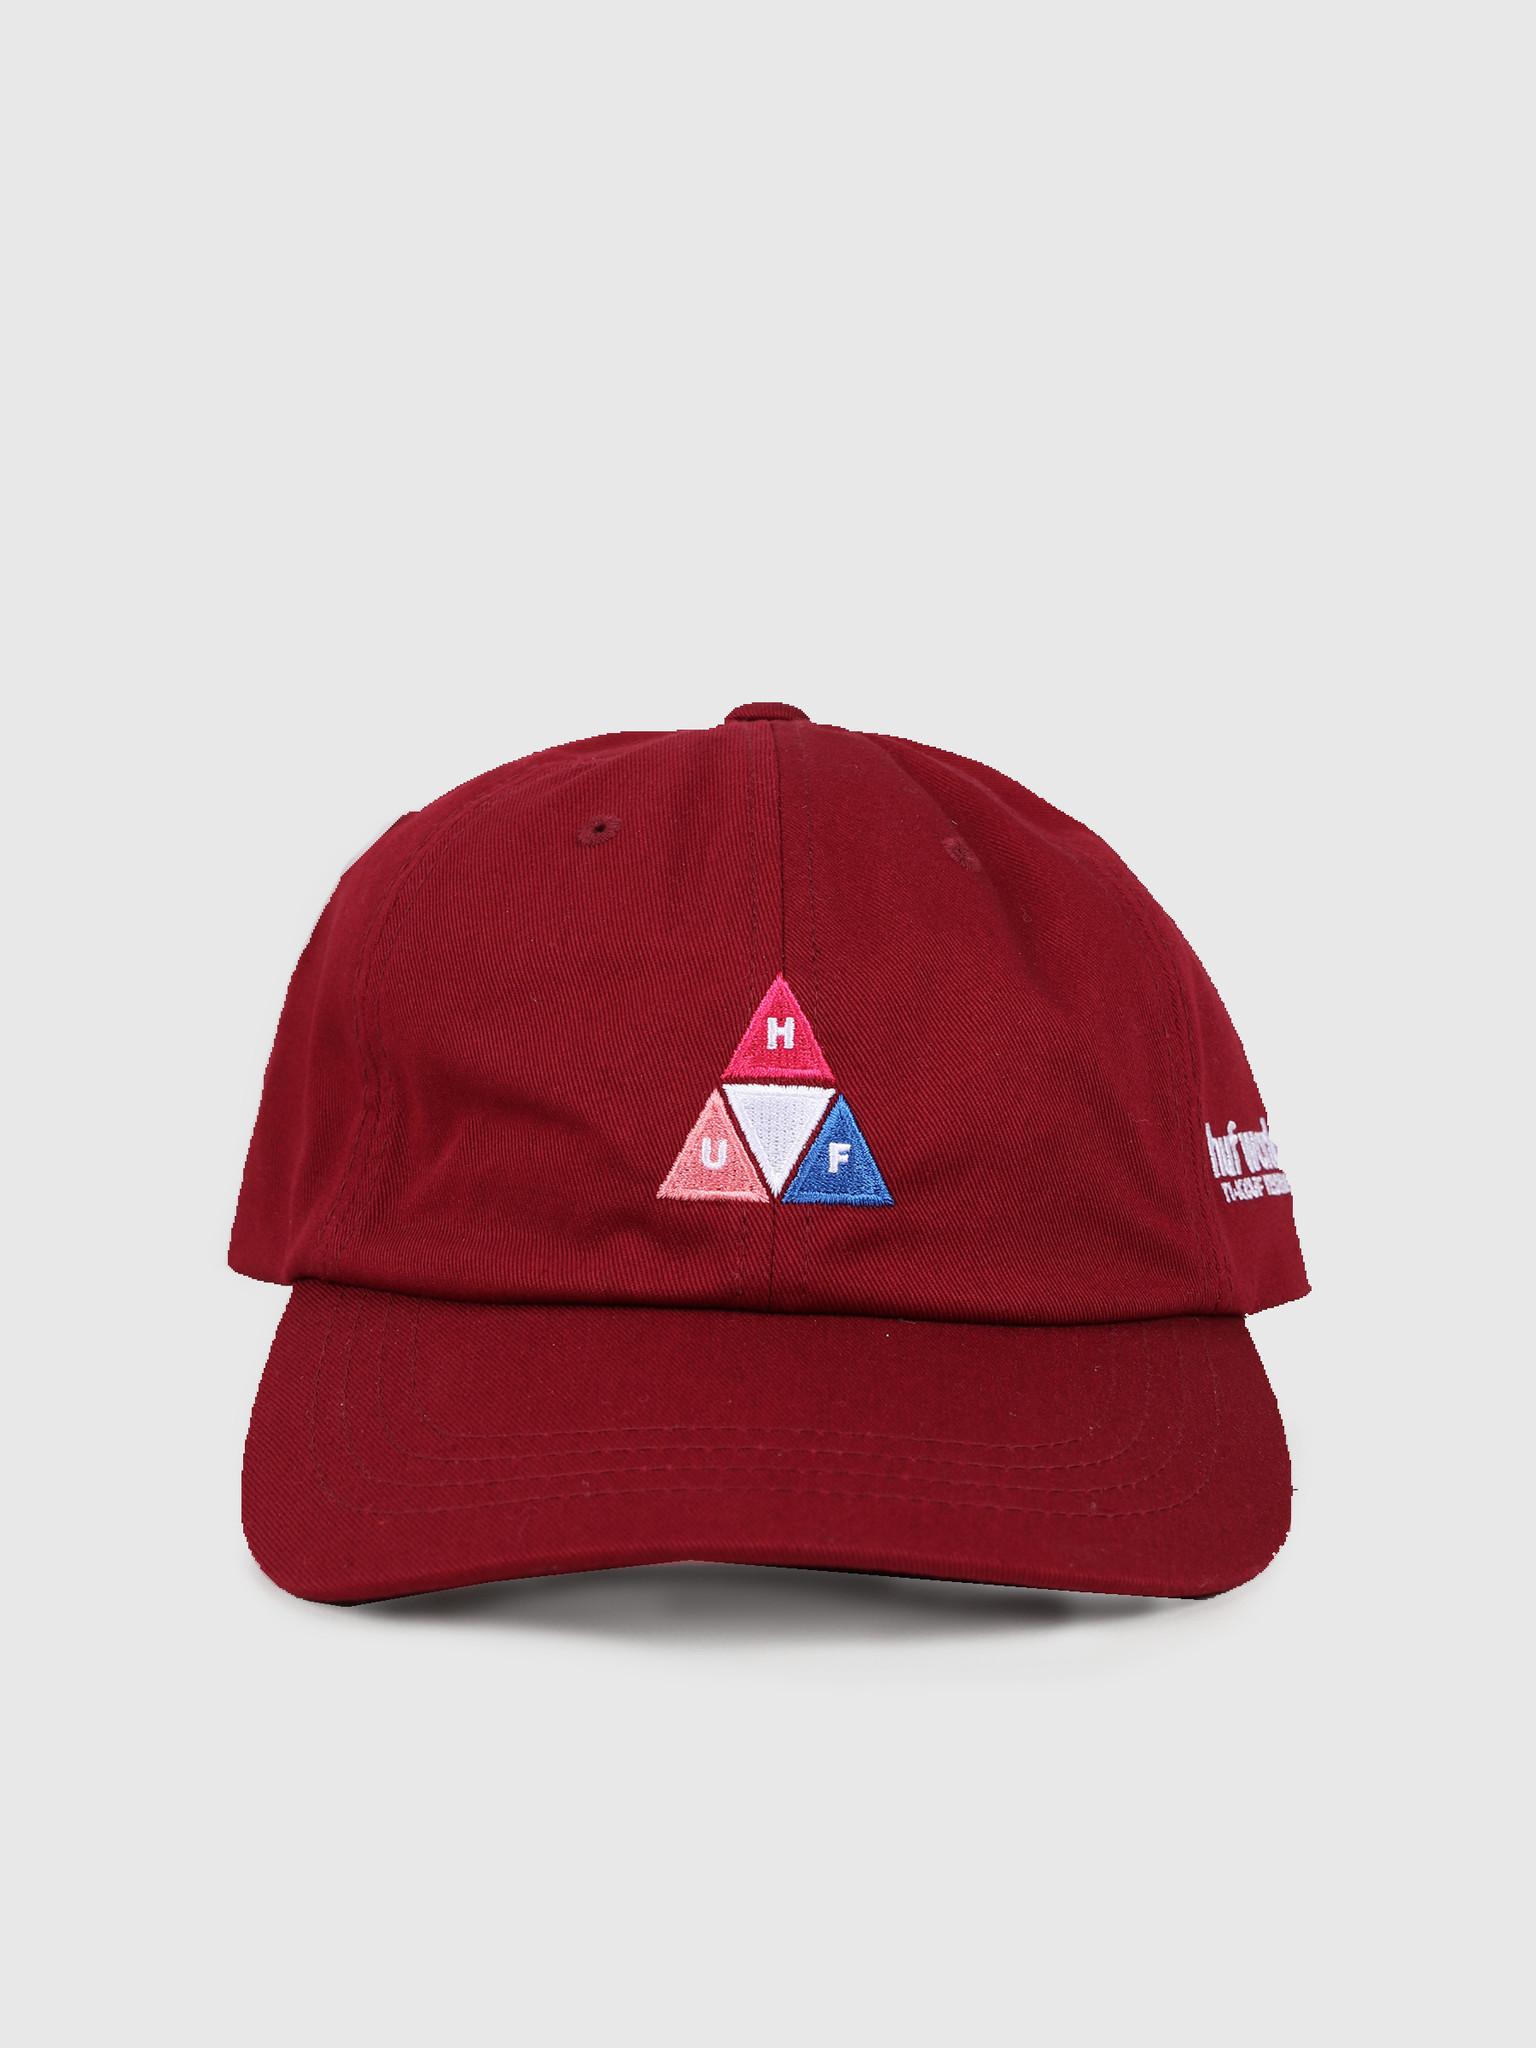 HUF HUF Peak Logo Cv 6 Panel Hat Red Pear Ht00424Rpear